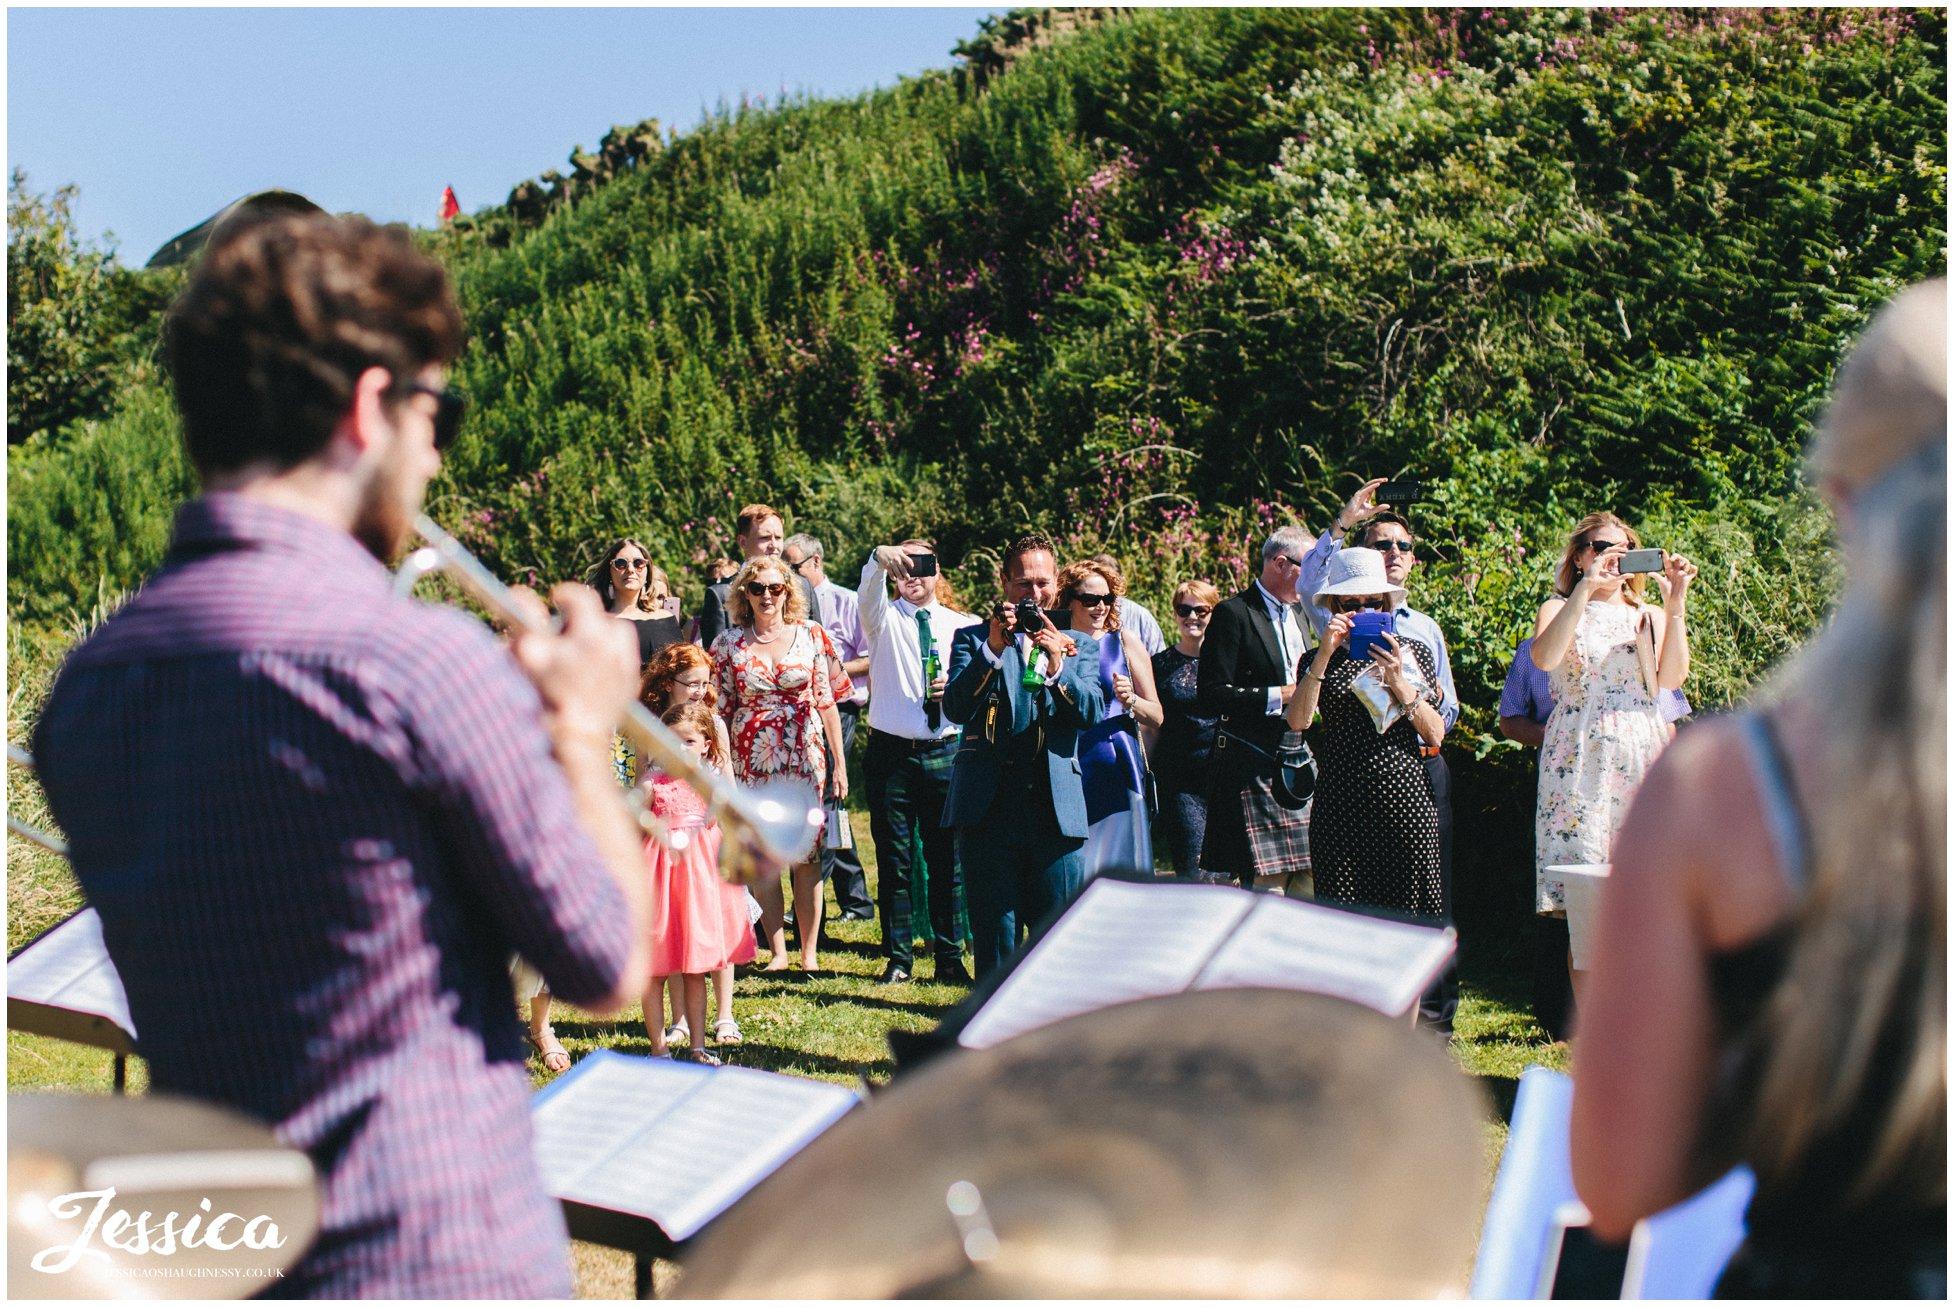 wedding guests enjoy the brass band playing by Caernarfon bay